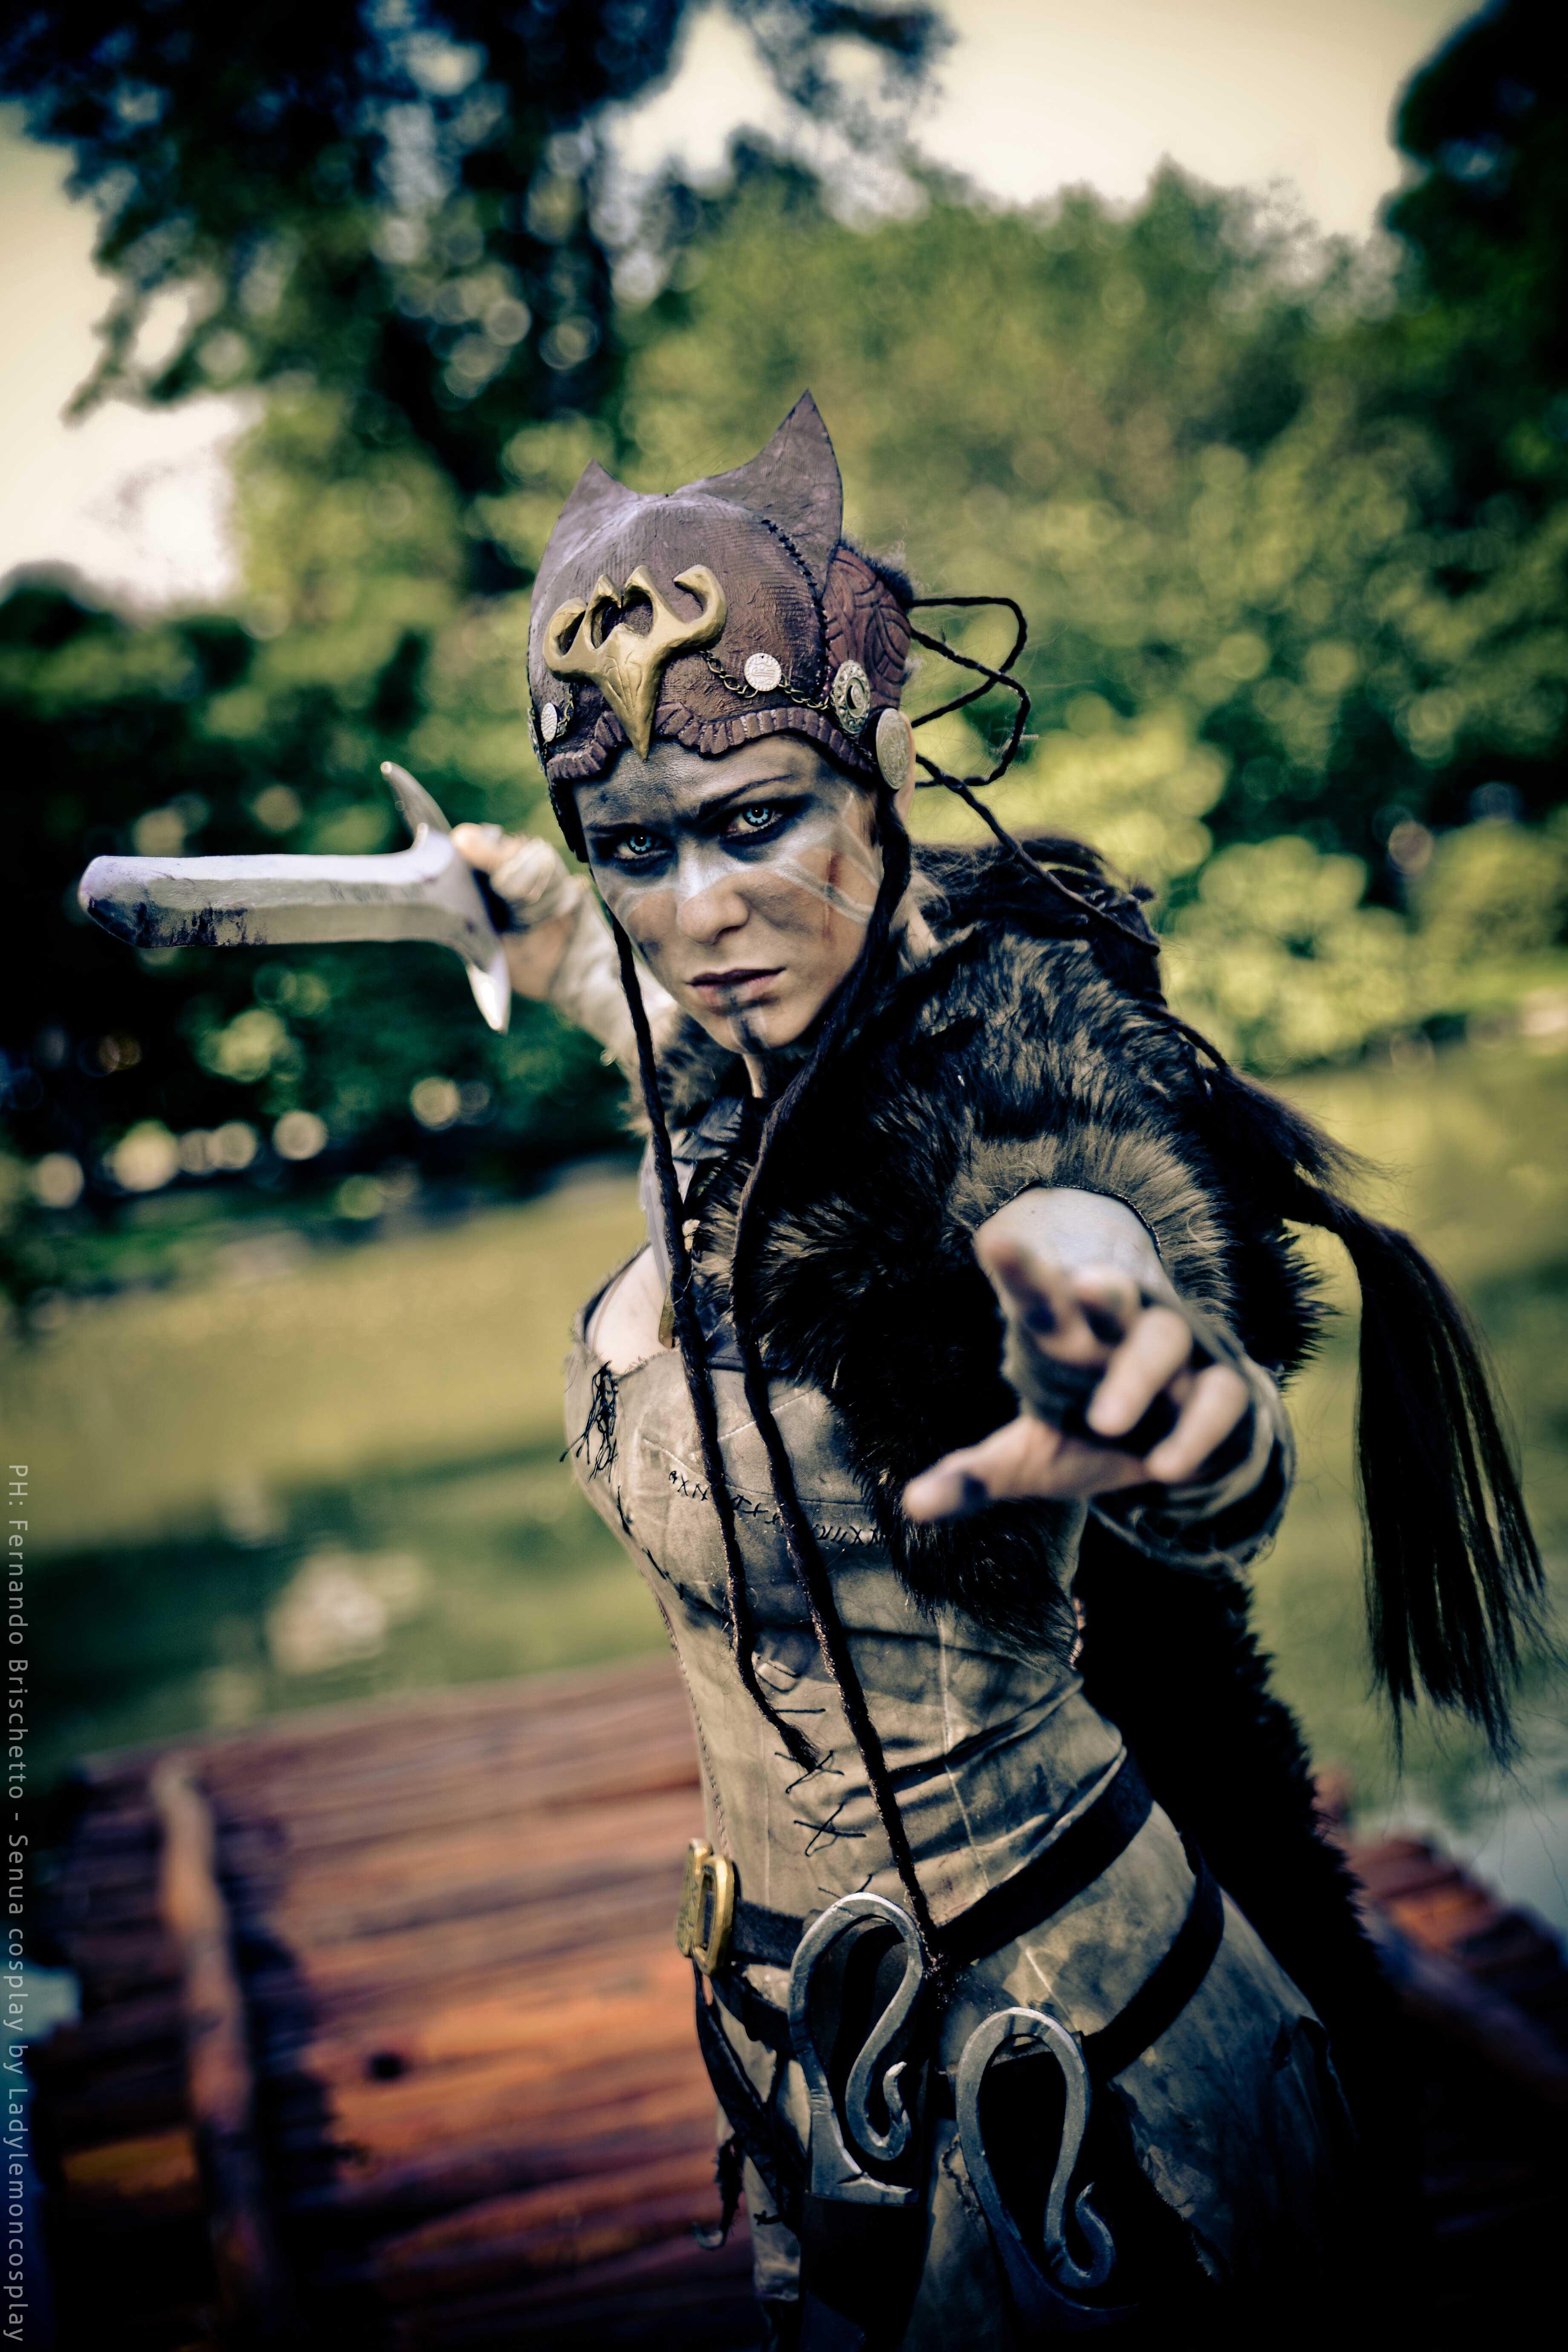 Hellblade Senua Cosplay Ready to Strike Starring LadyLemon